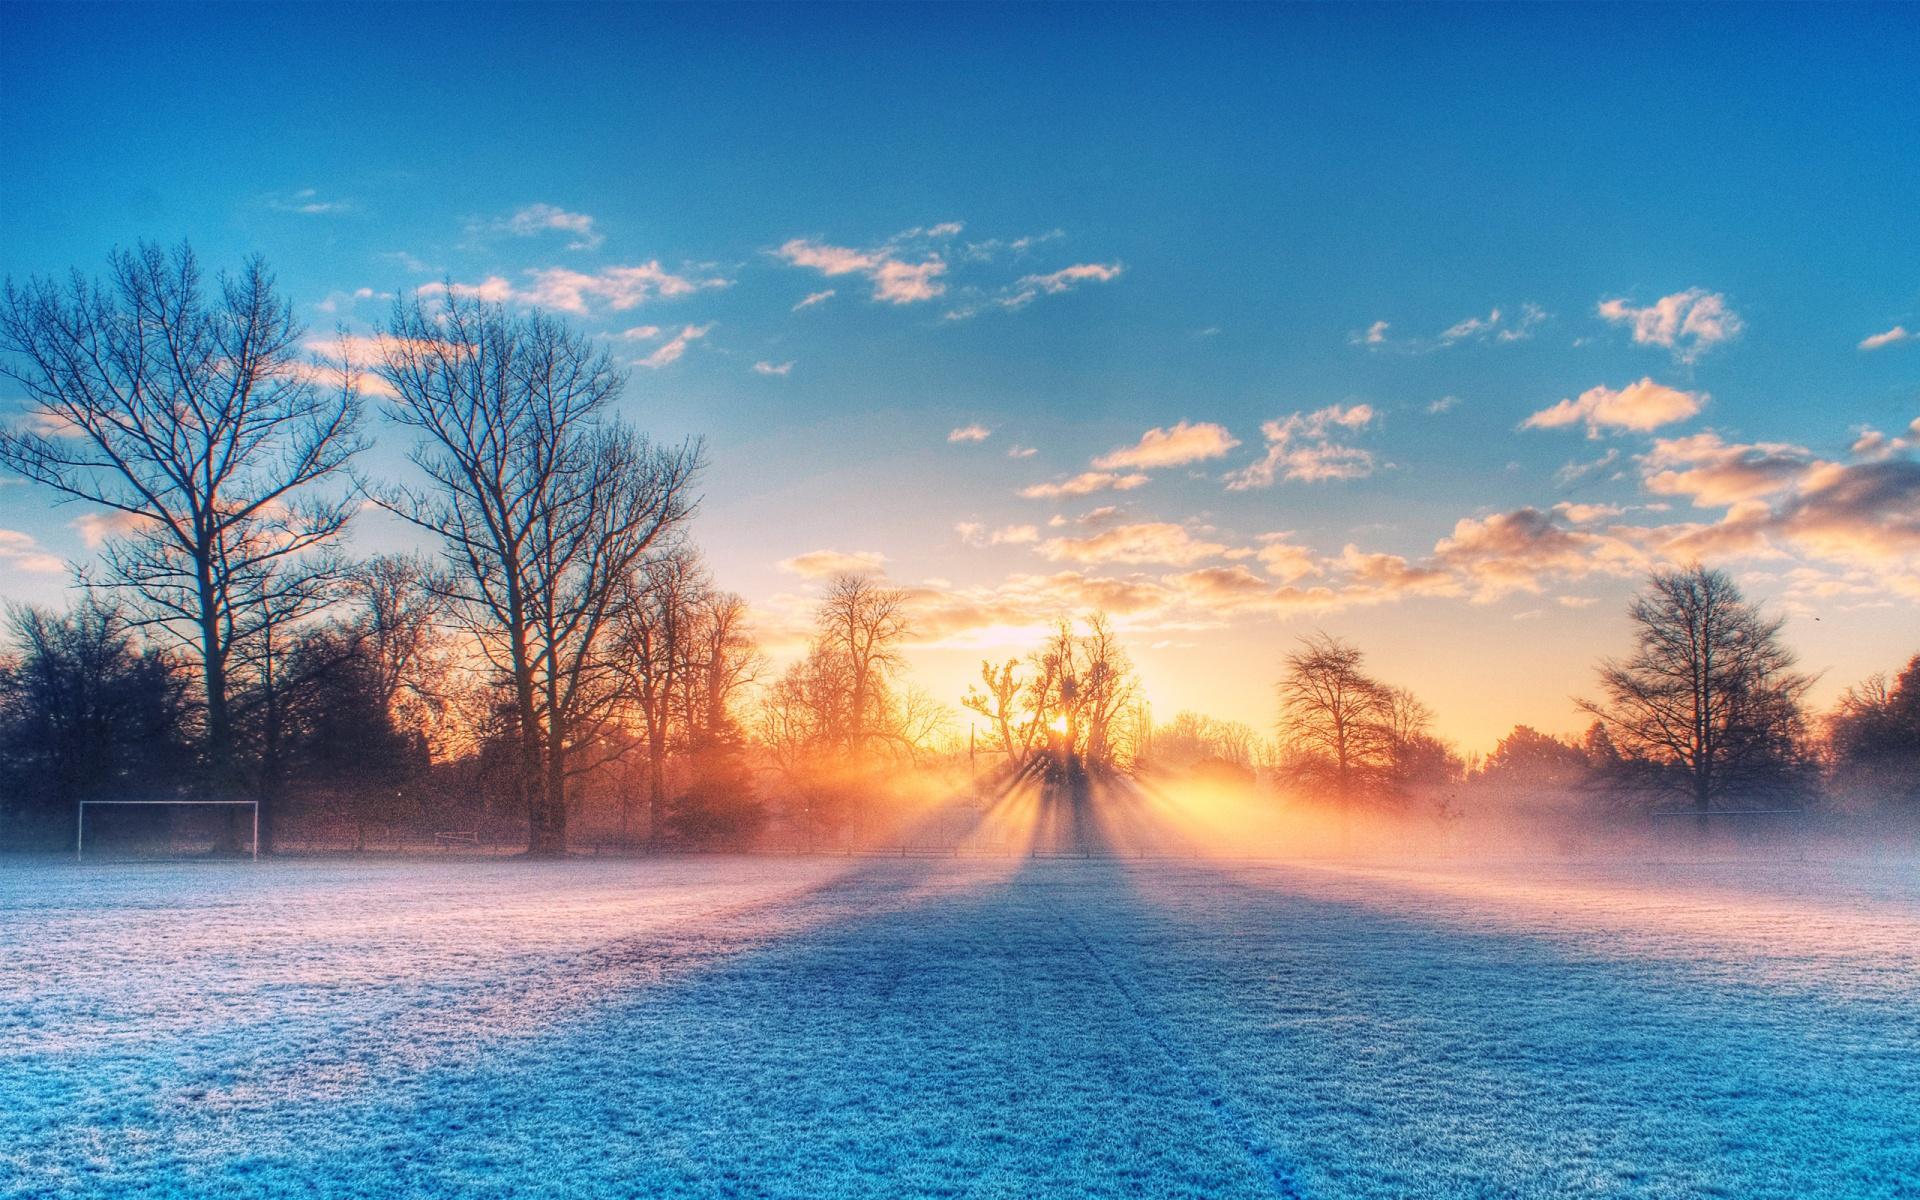 Wallpaper Nature Full Size Desktop - Frosty Morning , HD Wallpaper & Backgrounds